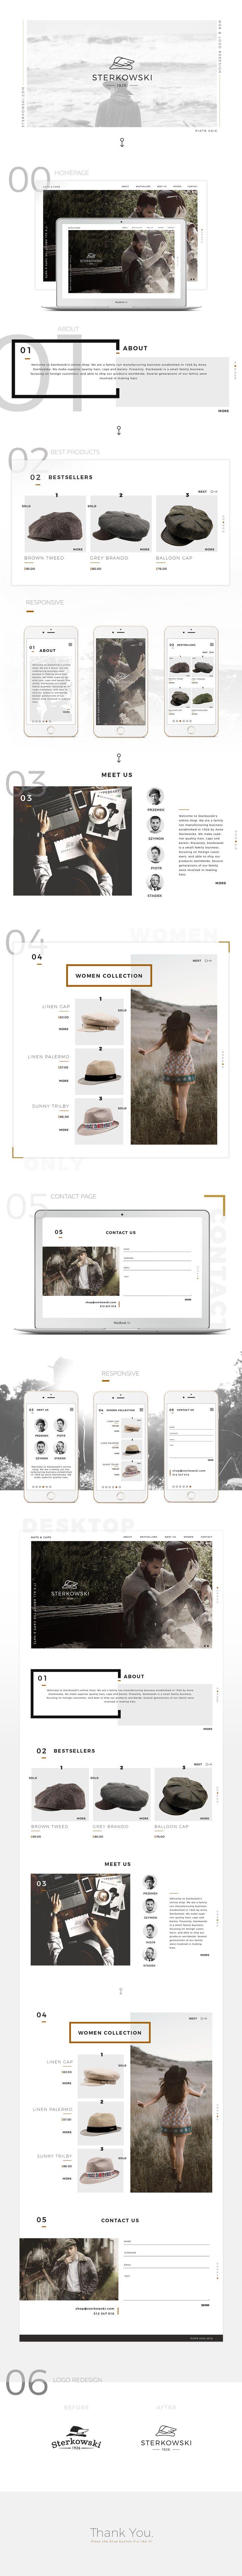 Web design inspiration UI/UX user experience fashion concept   Sterkowski.com — Website & Logo Redesign on Behance